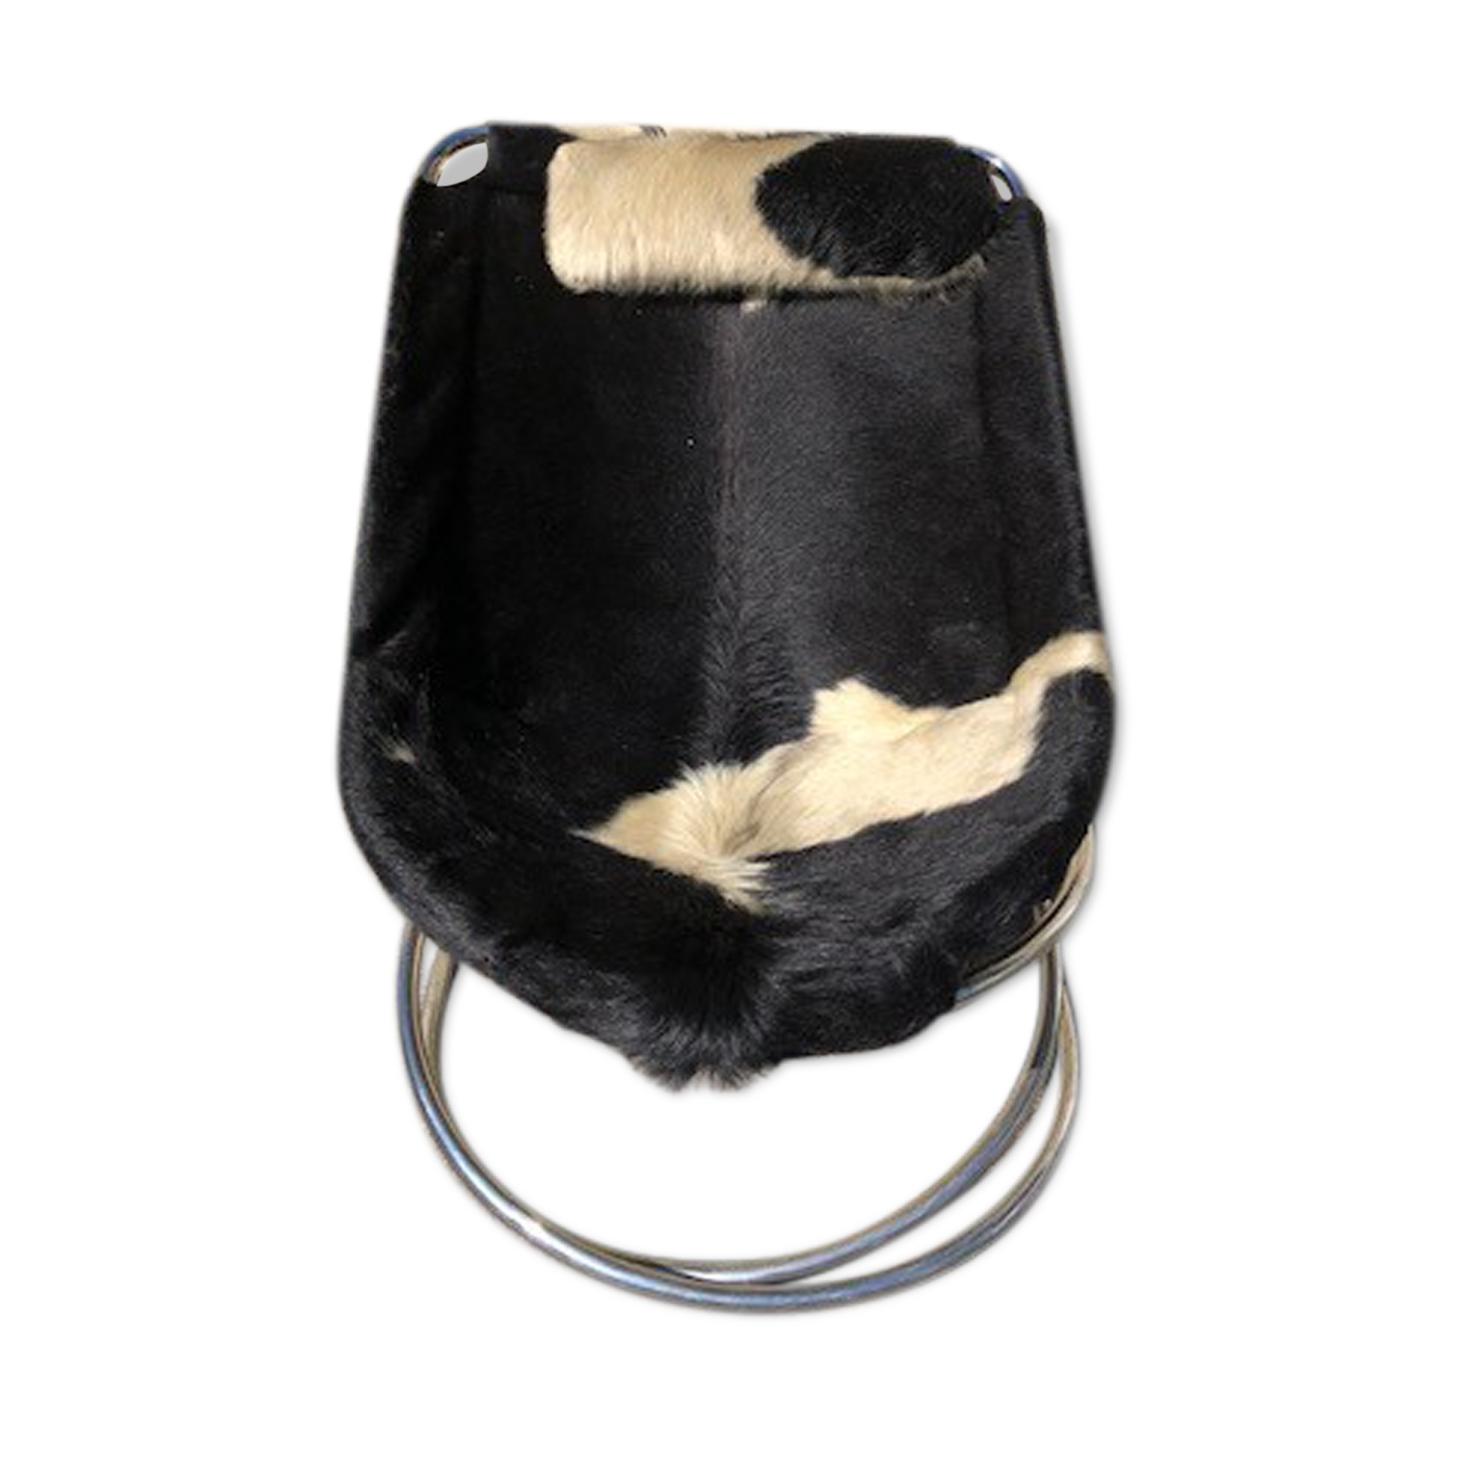 Fauteuil design peau de vache